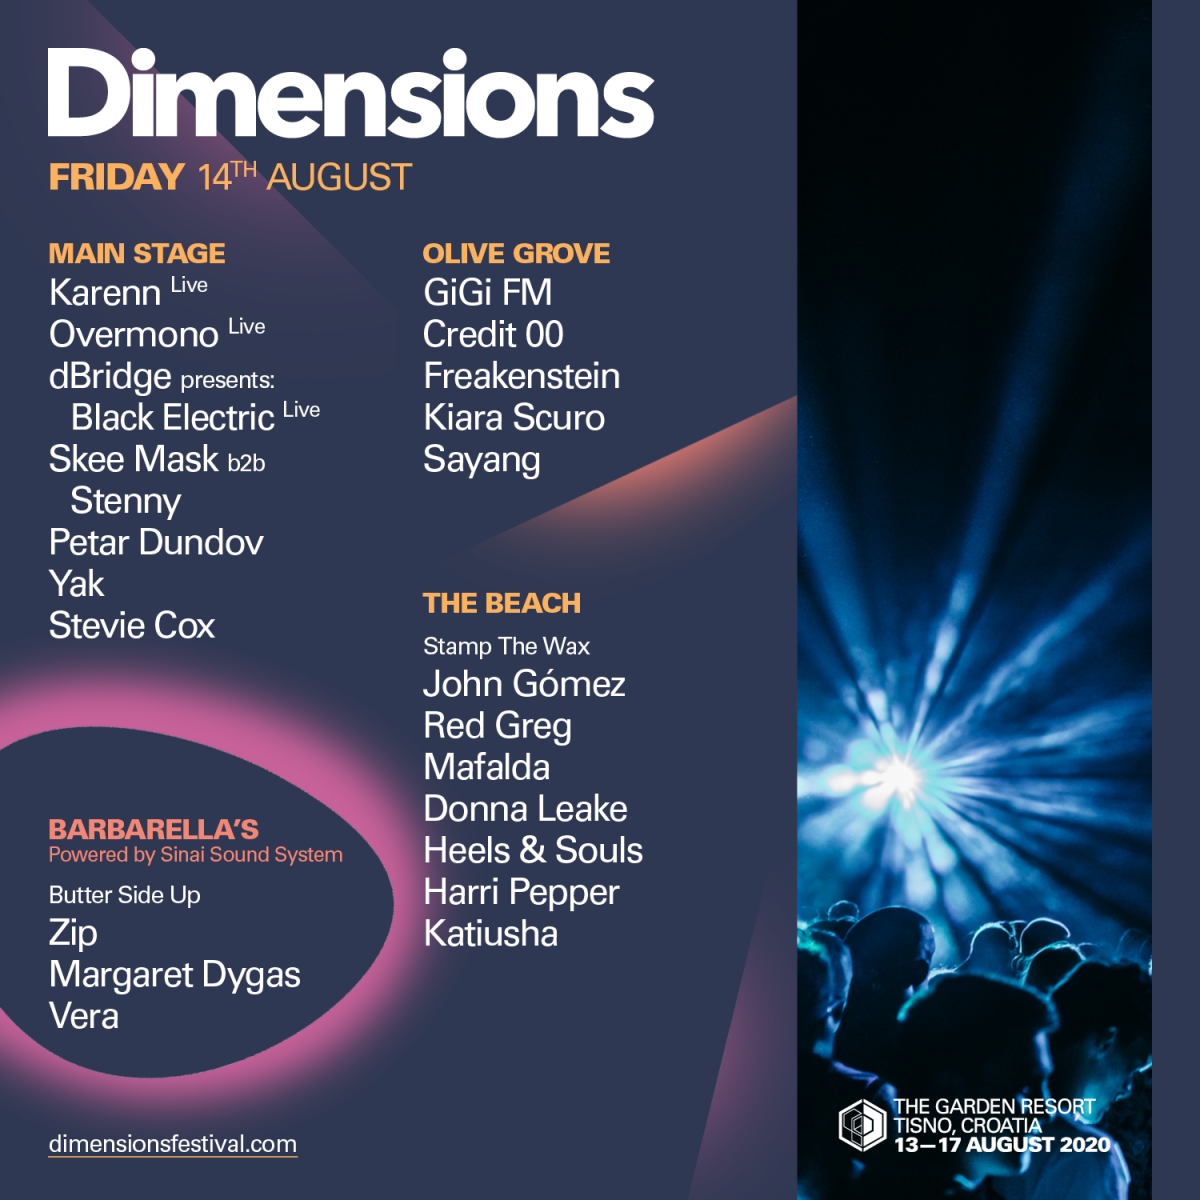 Objavljen detaljan program Dimensions festivala 2020 na pozornicama u The Gardenu i klubu Barbarella's